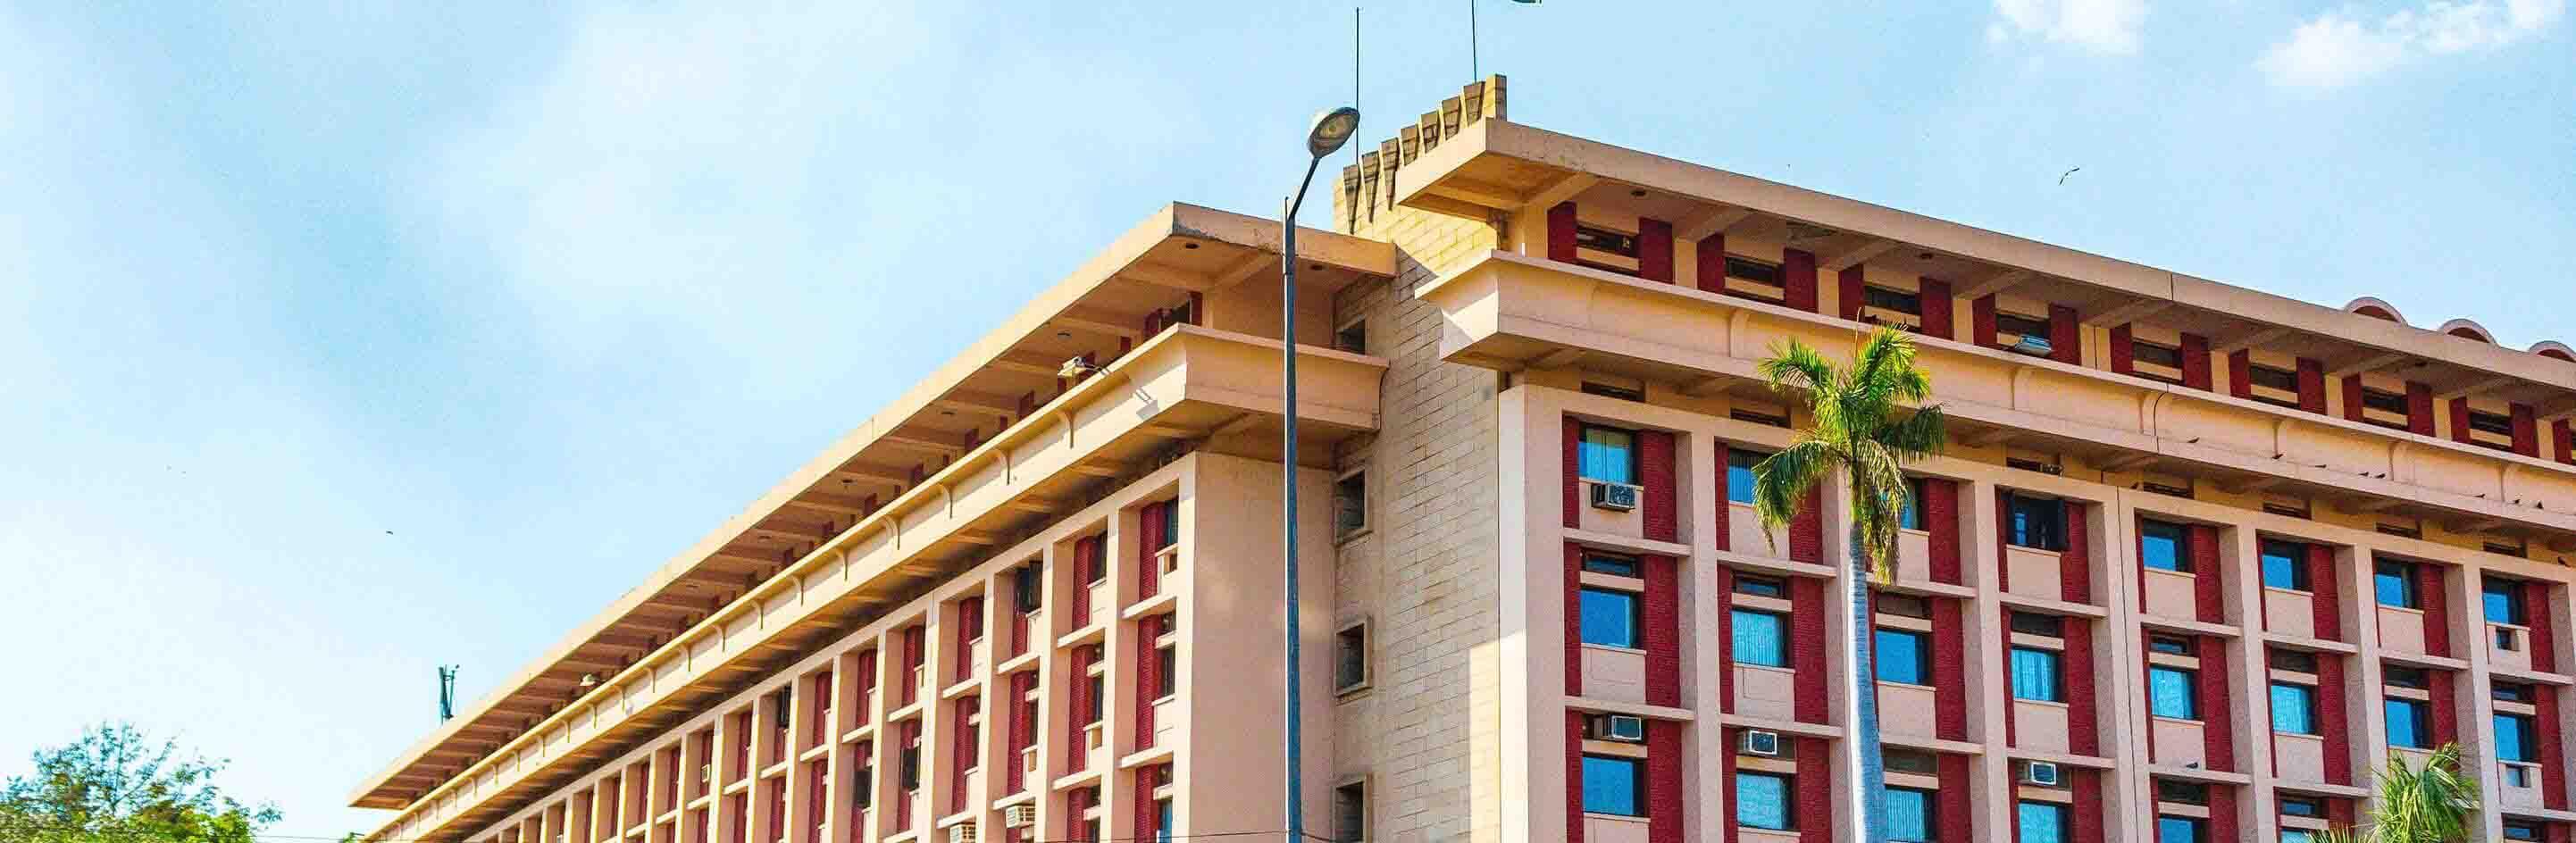 Indian Ministry of Railways Internship Program